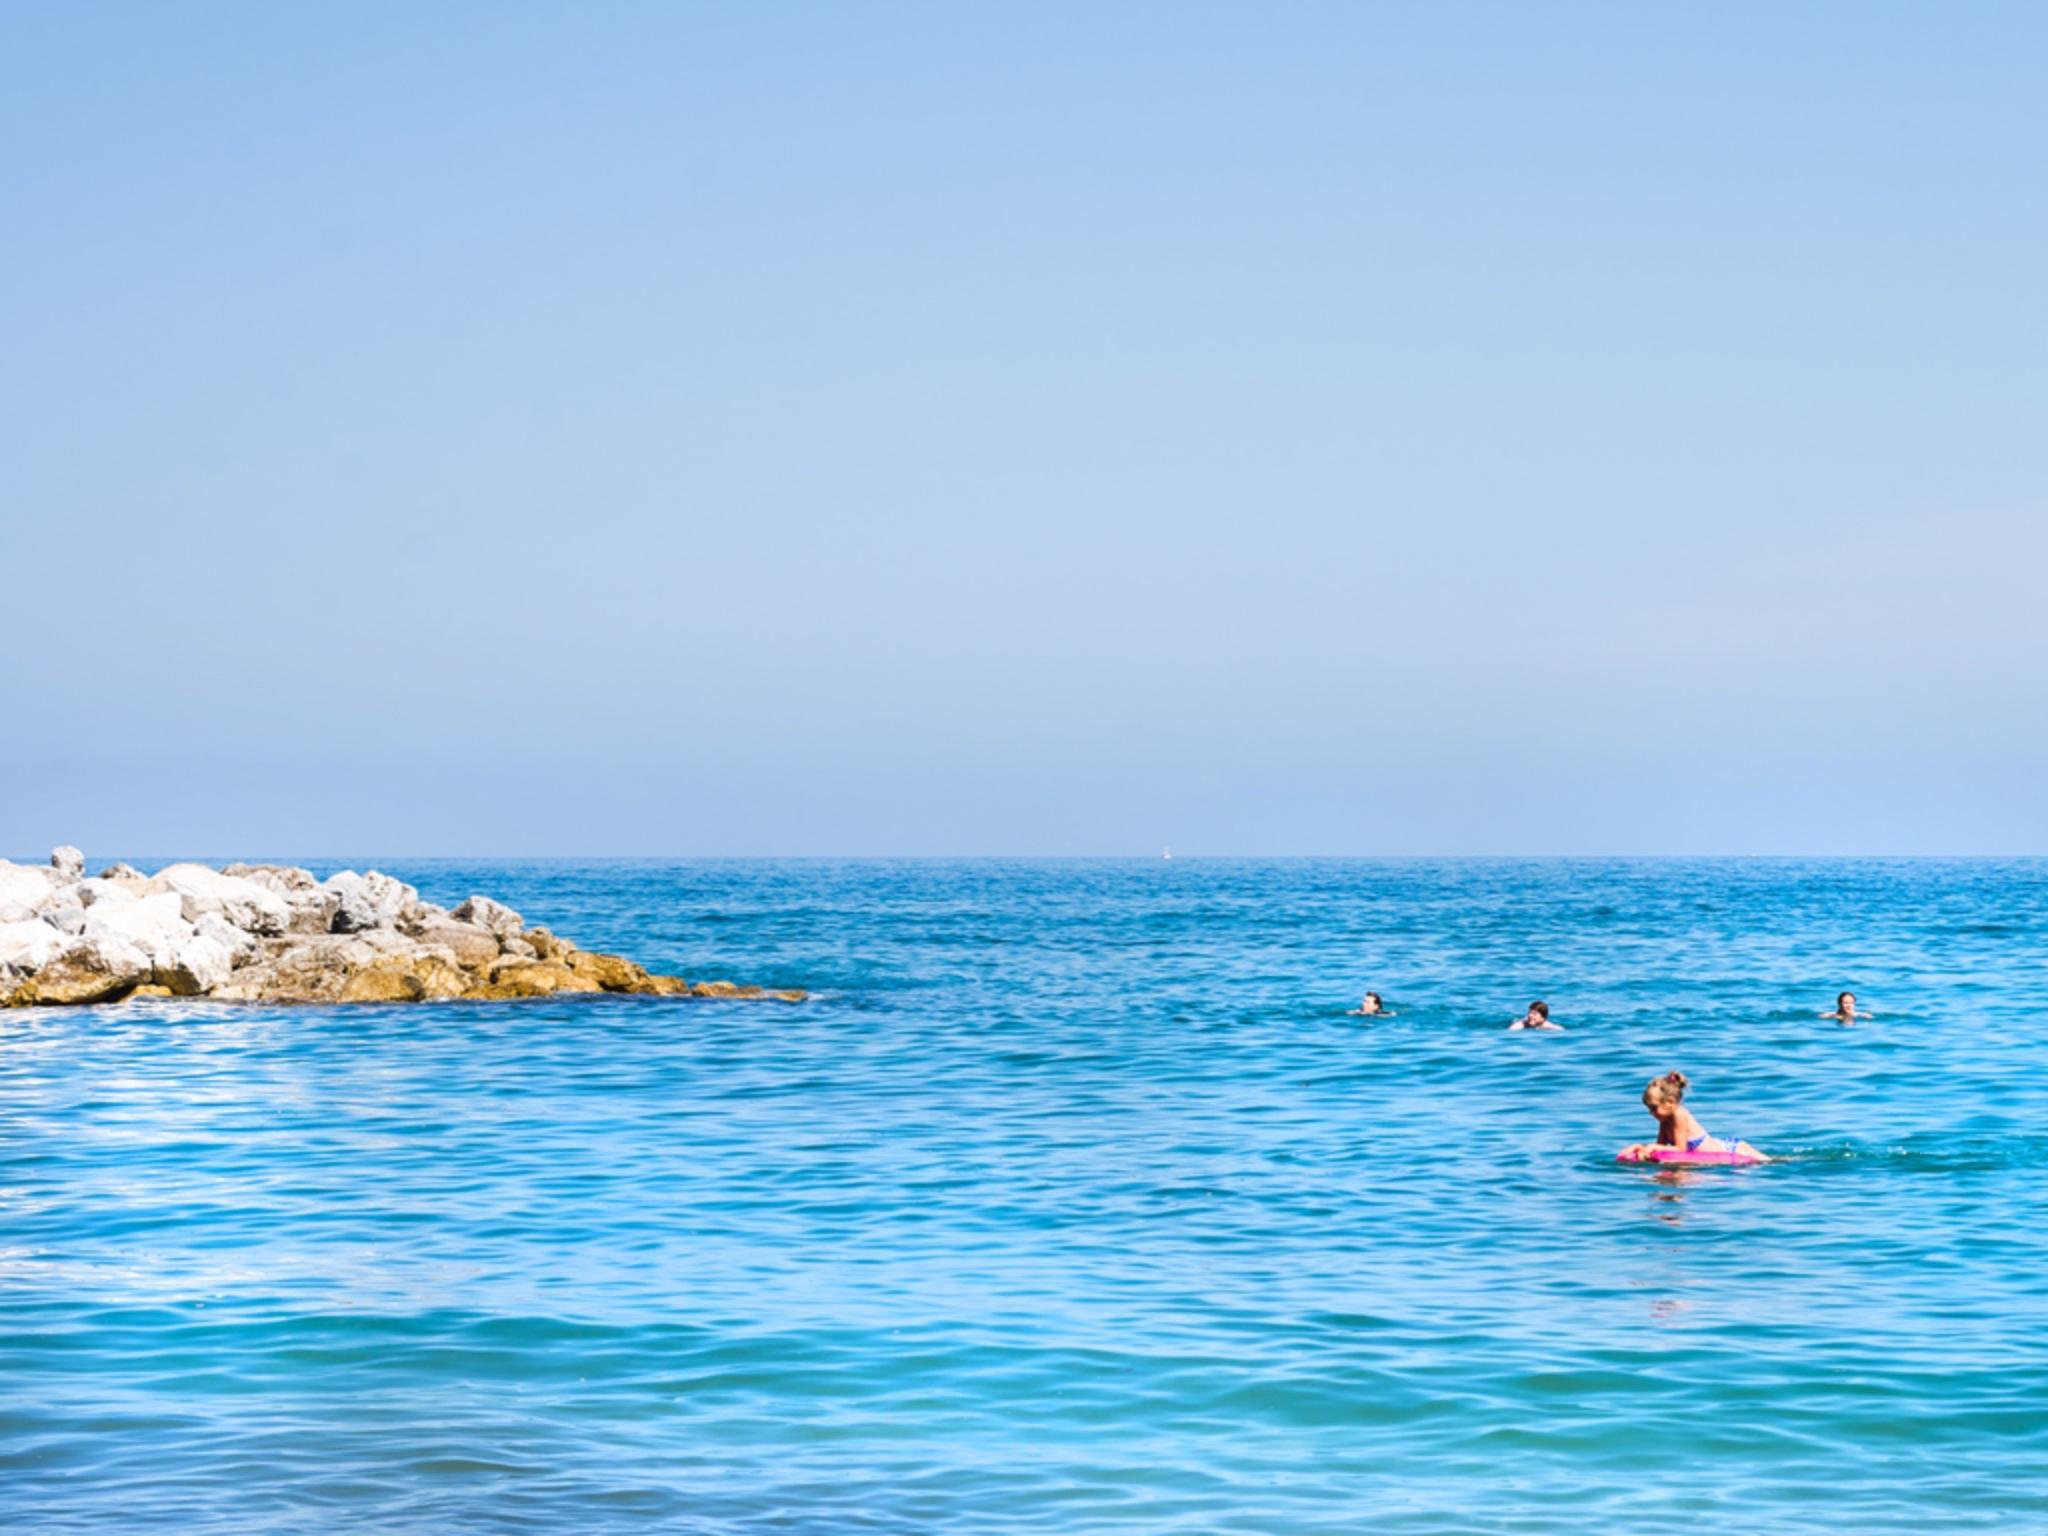 Urlaub am Meer. Foto: Pascal Höfig.